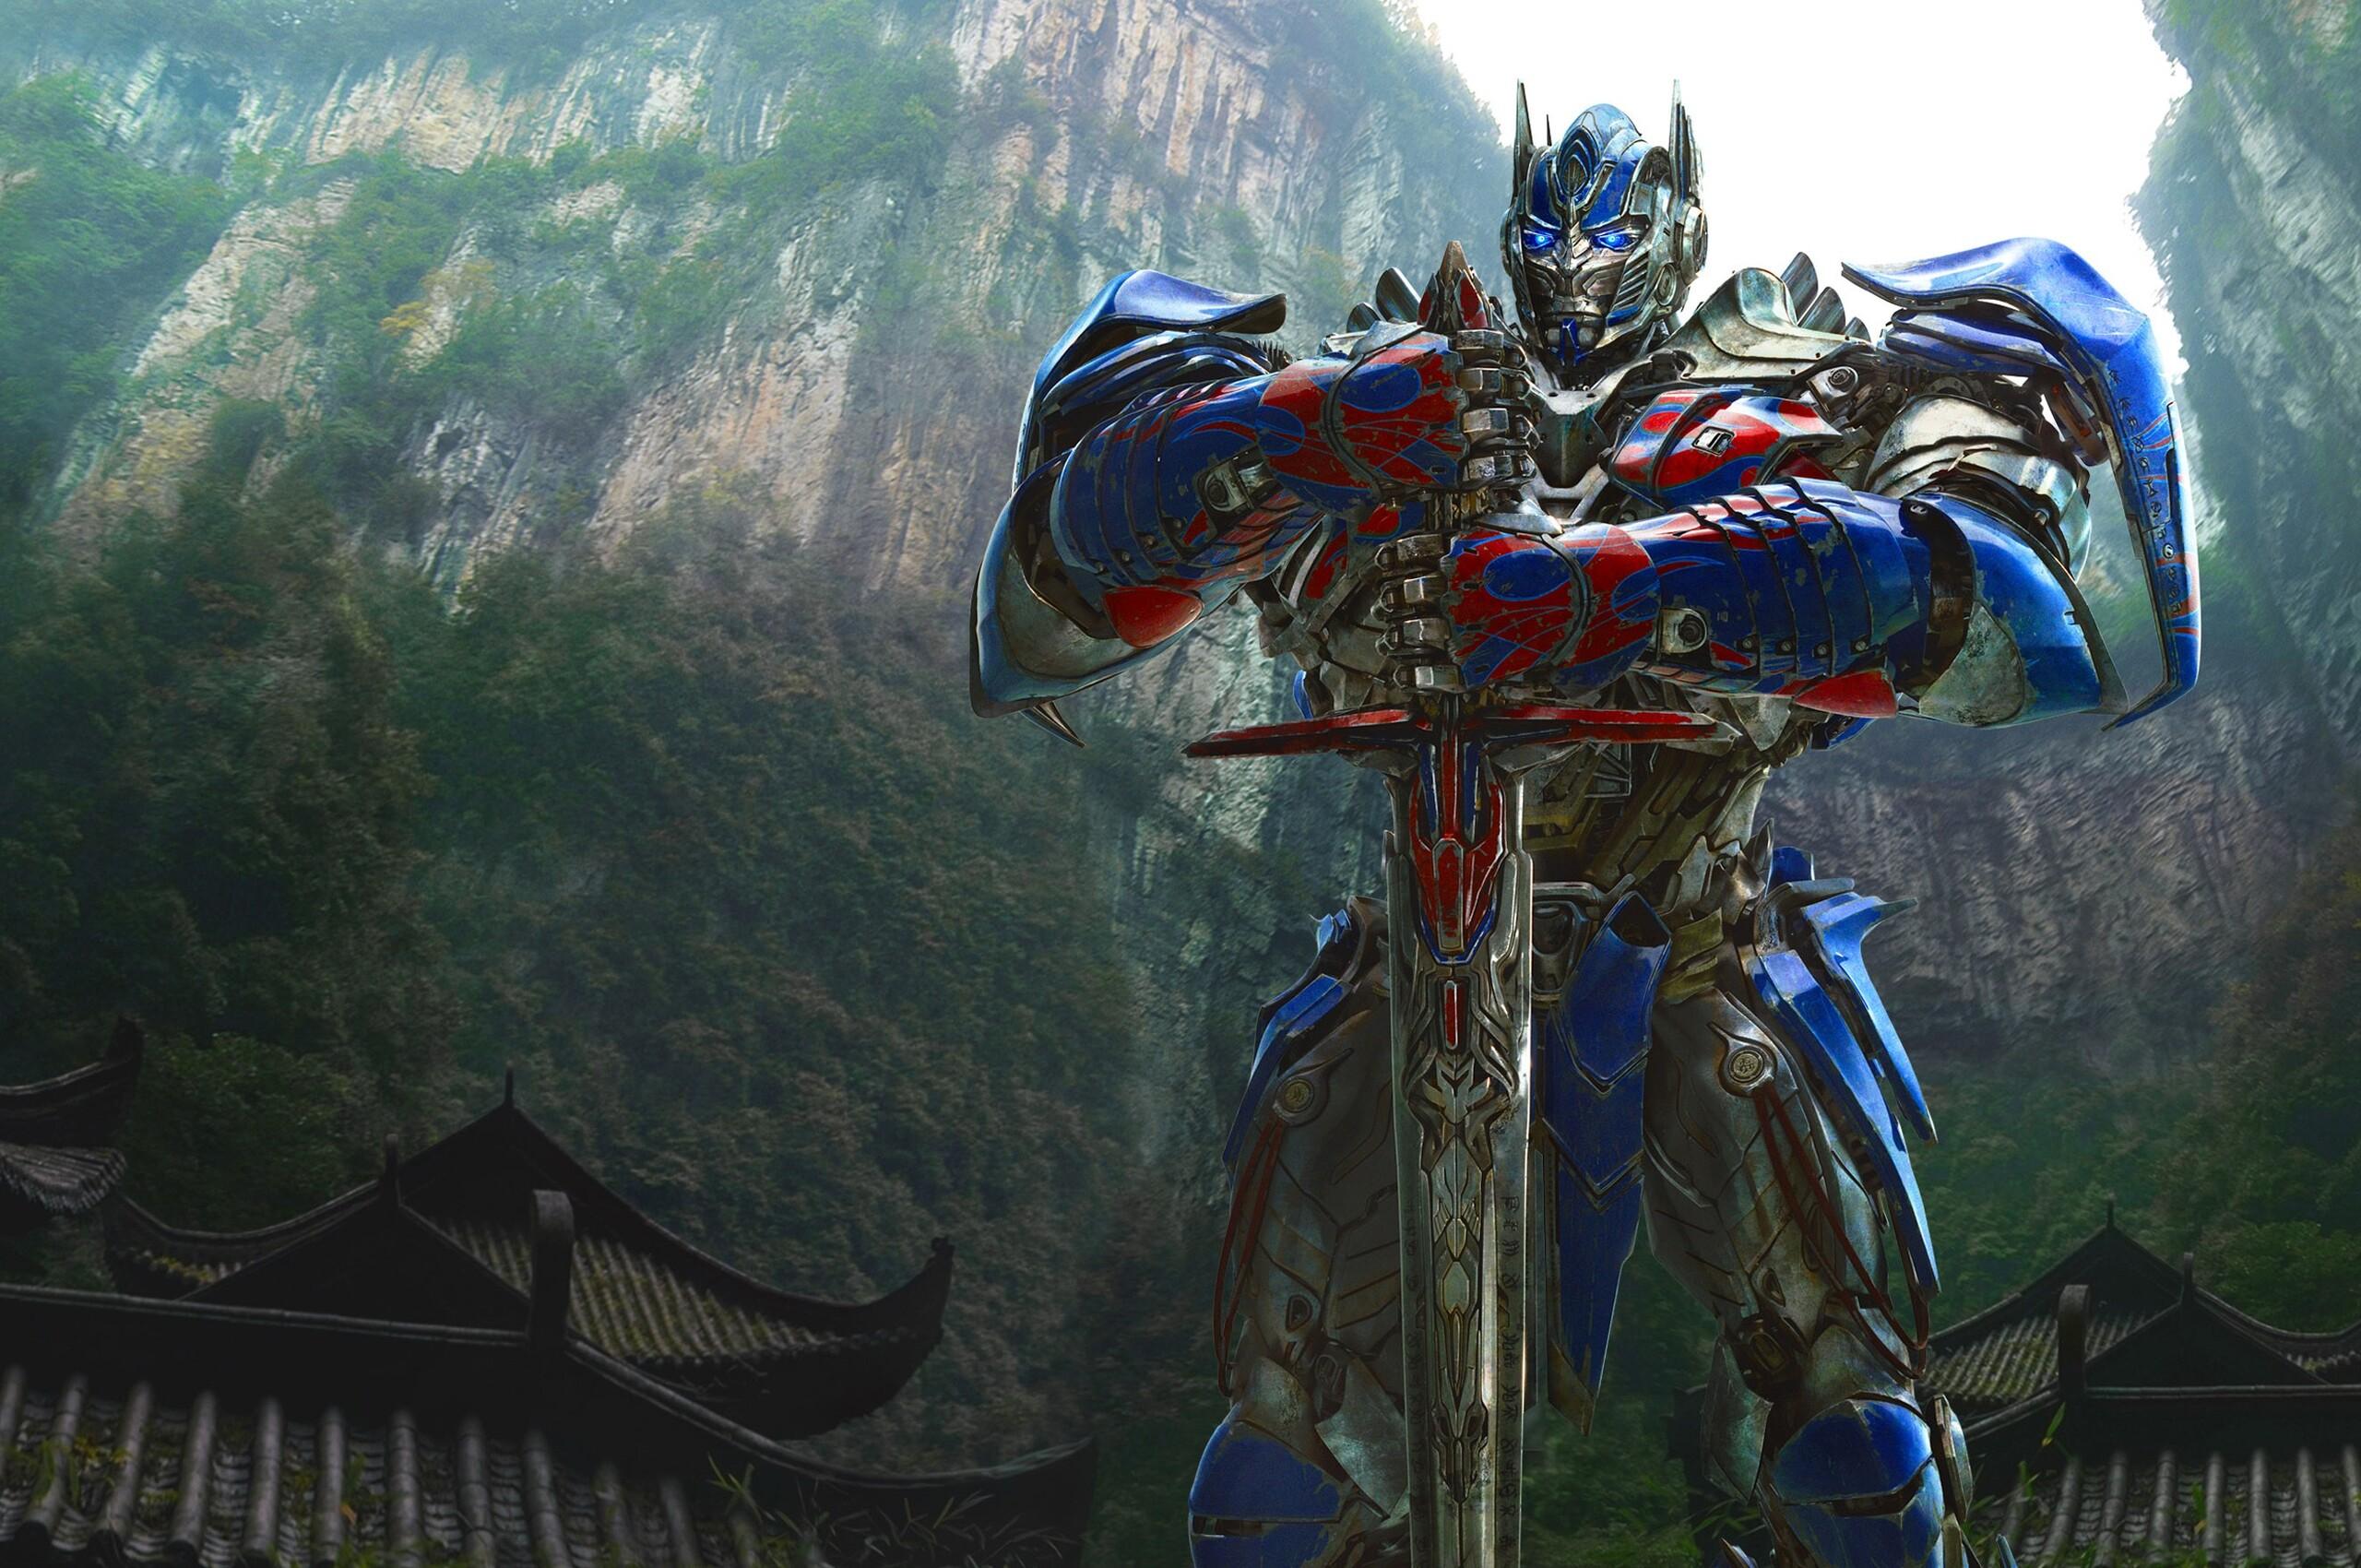 optimus-prime-in-transformers.jpg